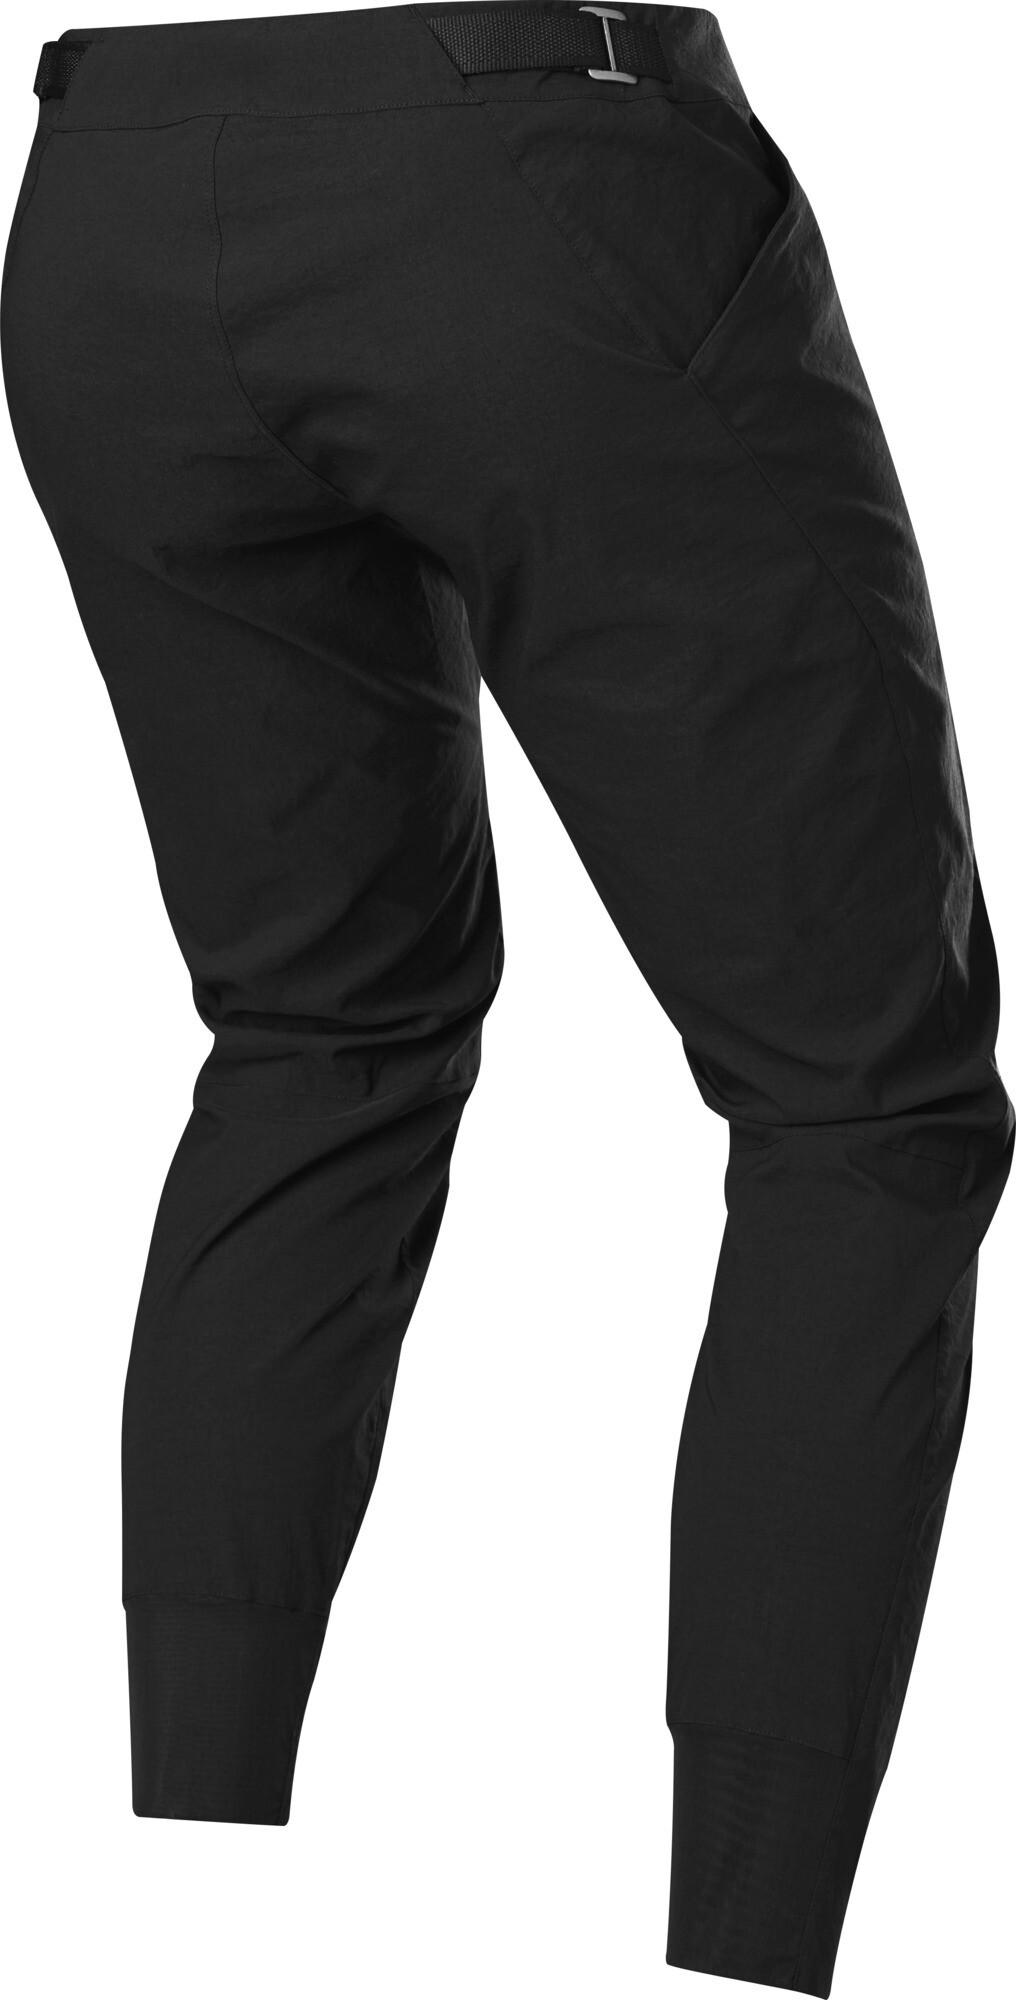 Fox Ranger Pantalones Hombre Black Bikester Es